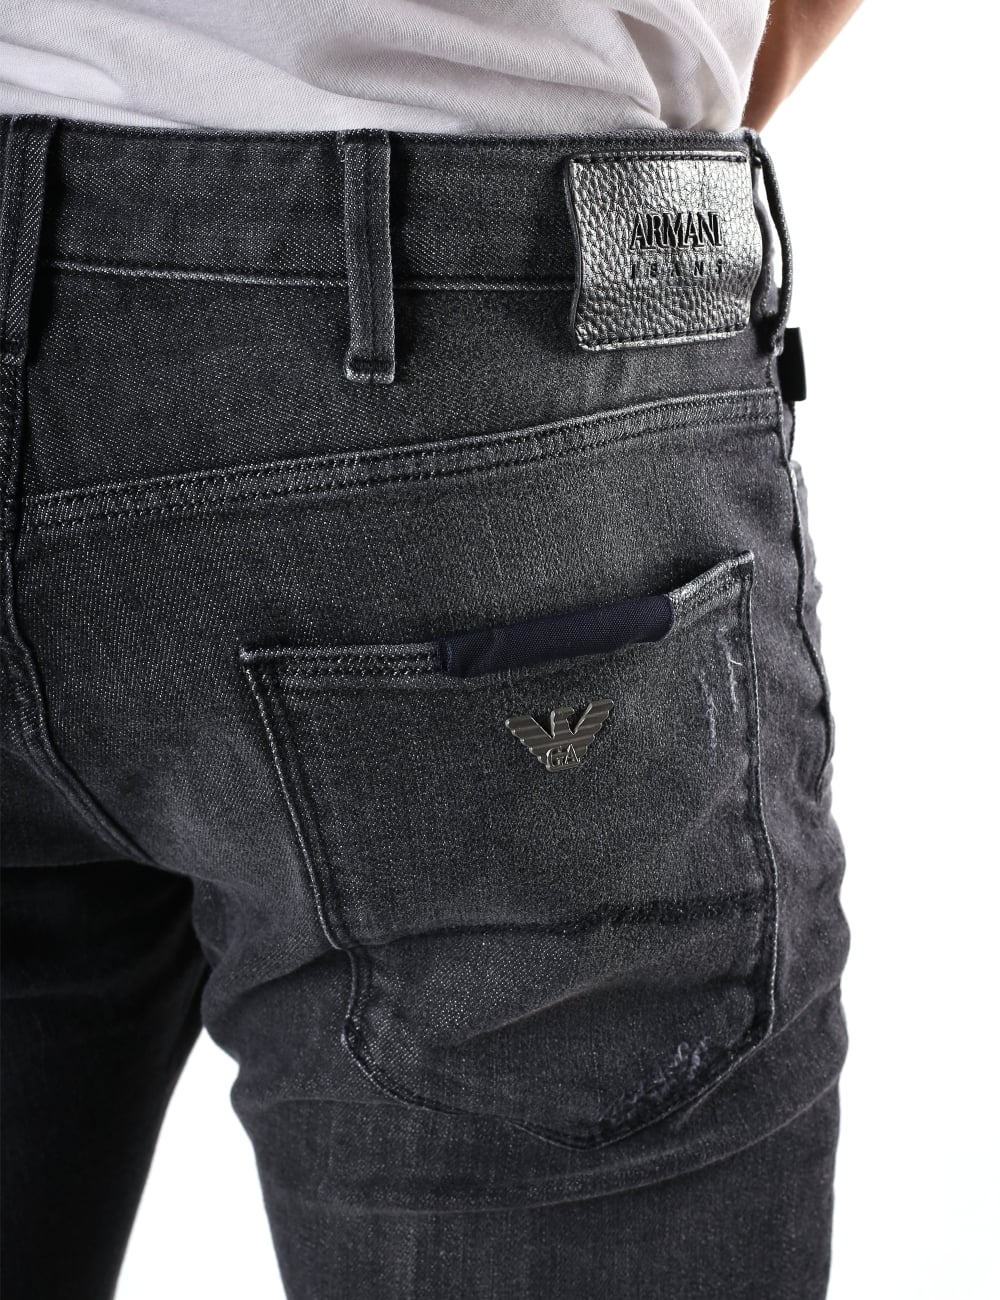 e08f34a4 Armani Jeans Men's Slim Fit Distressed Jean